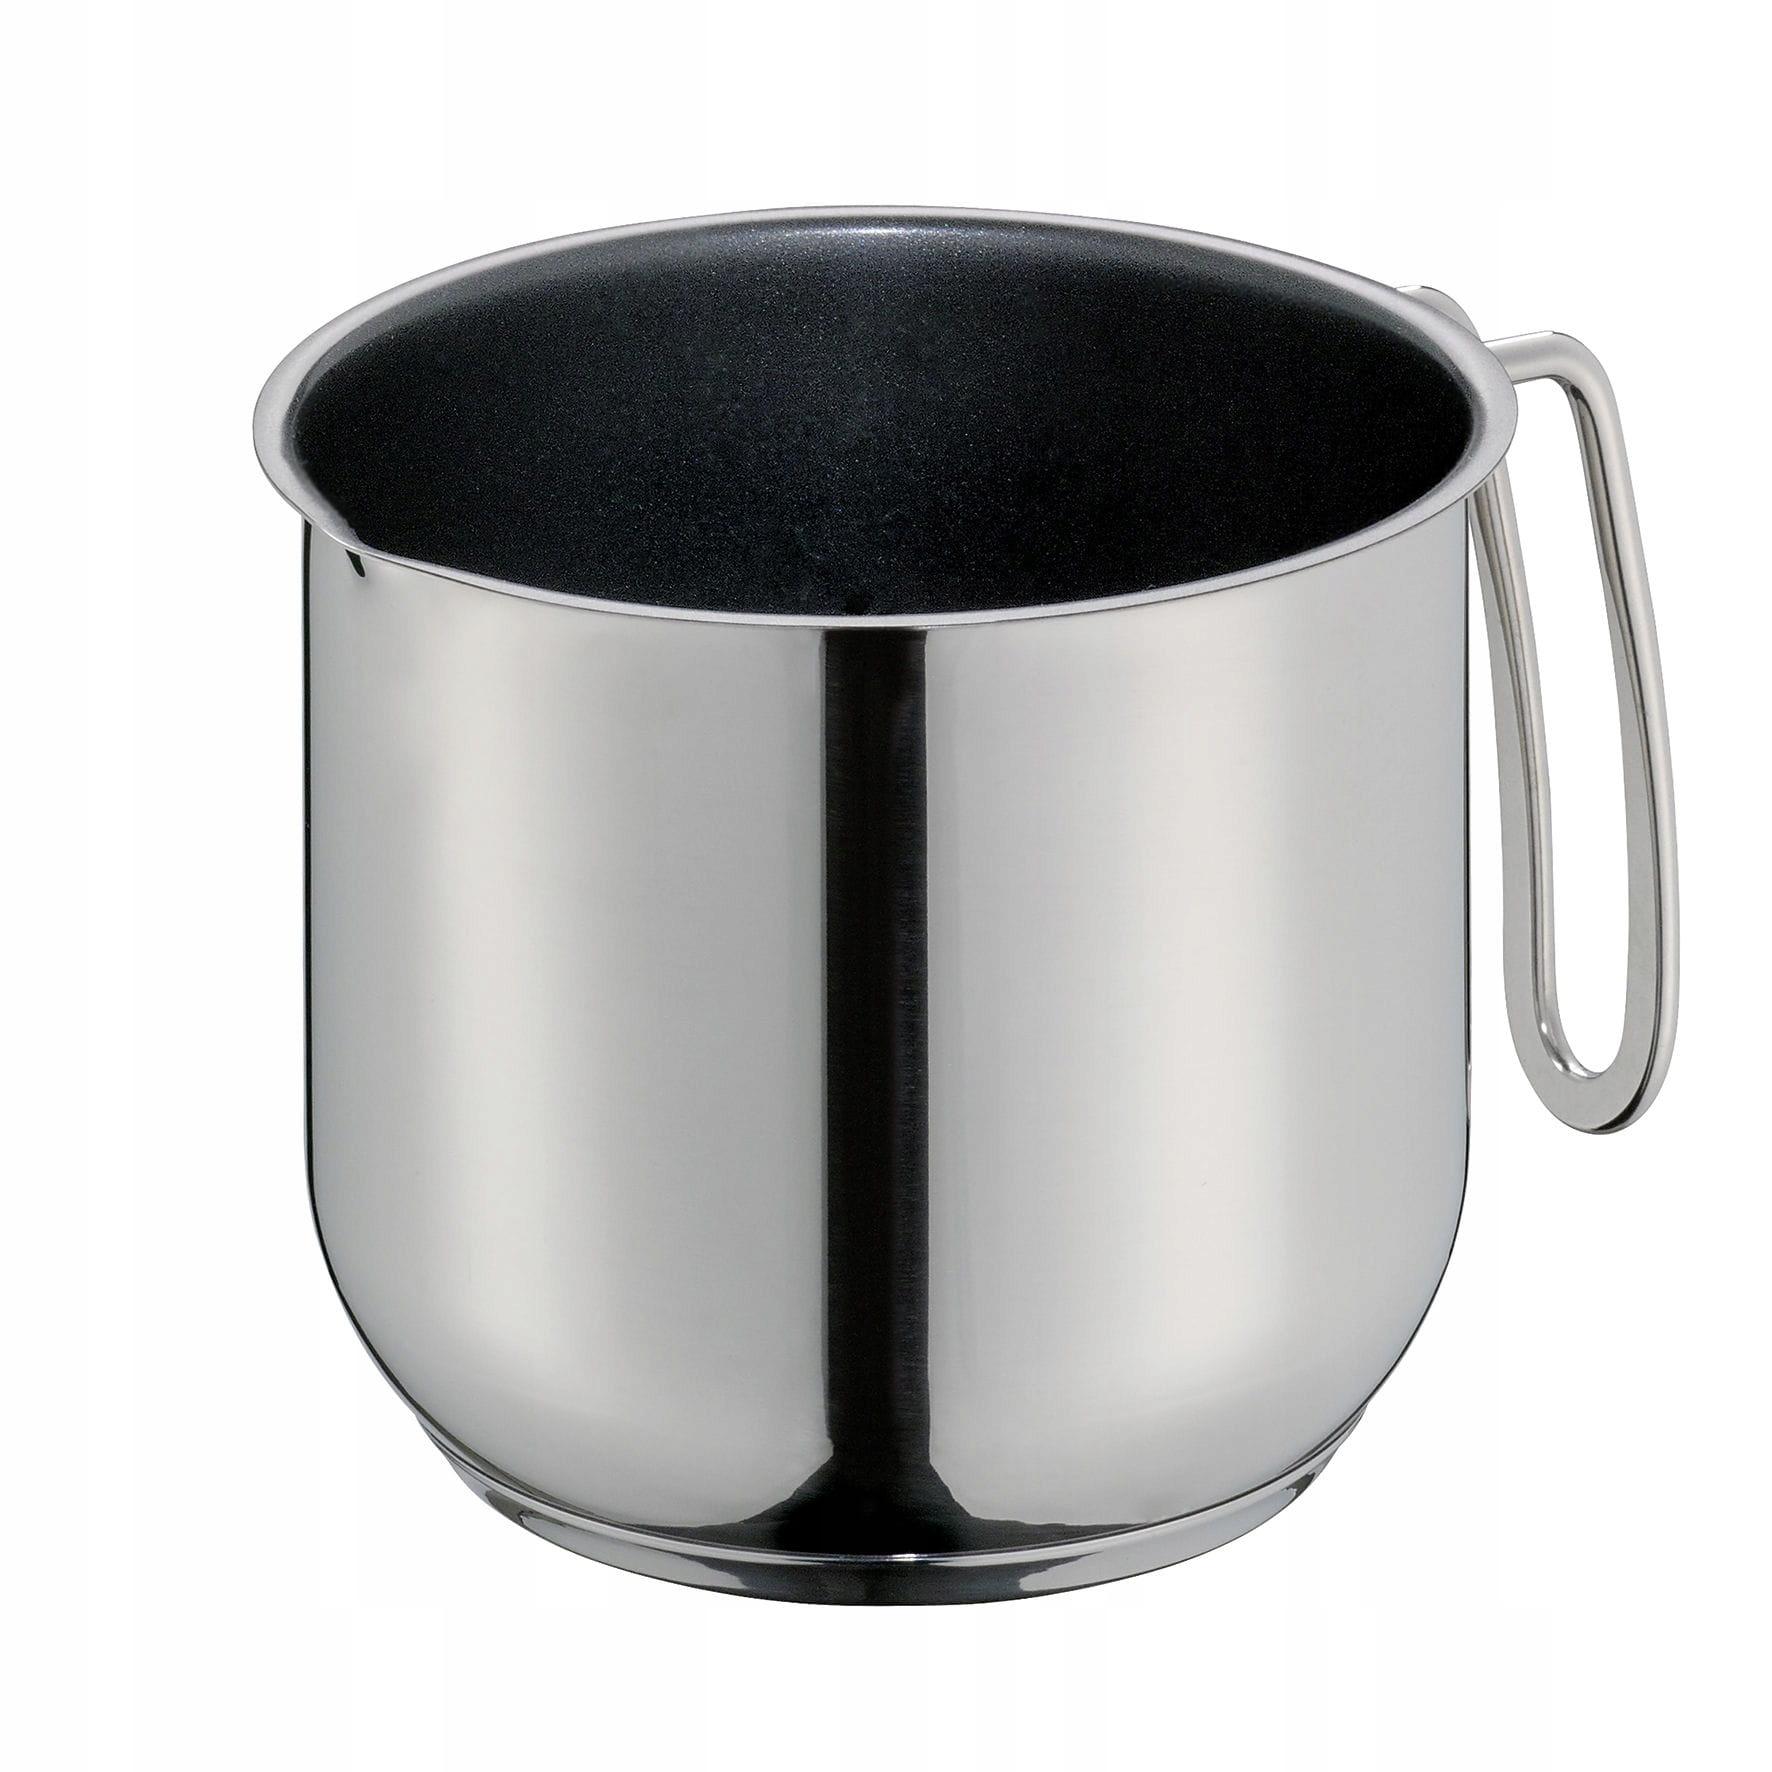 Kuchenprofi hrniec na mlieko 1,5 l 14x12,5 cm, oceľ